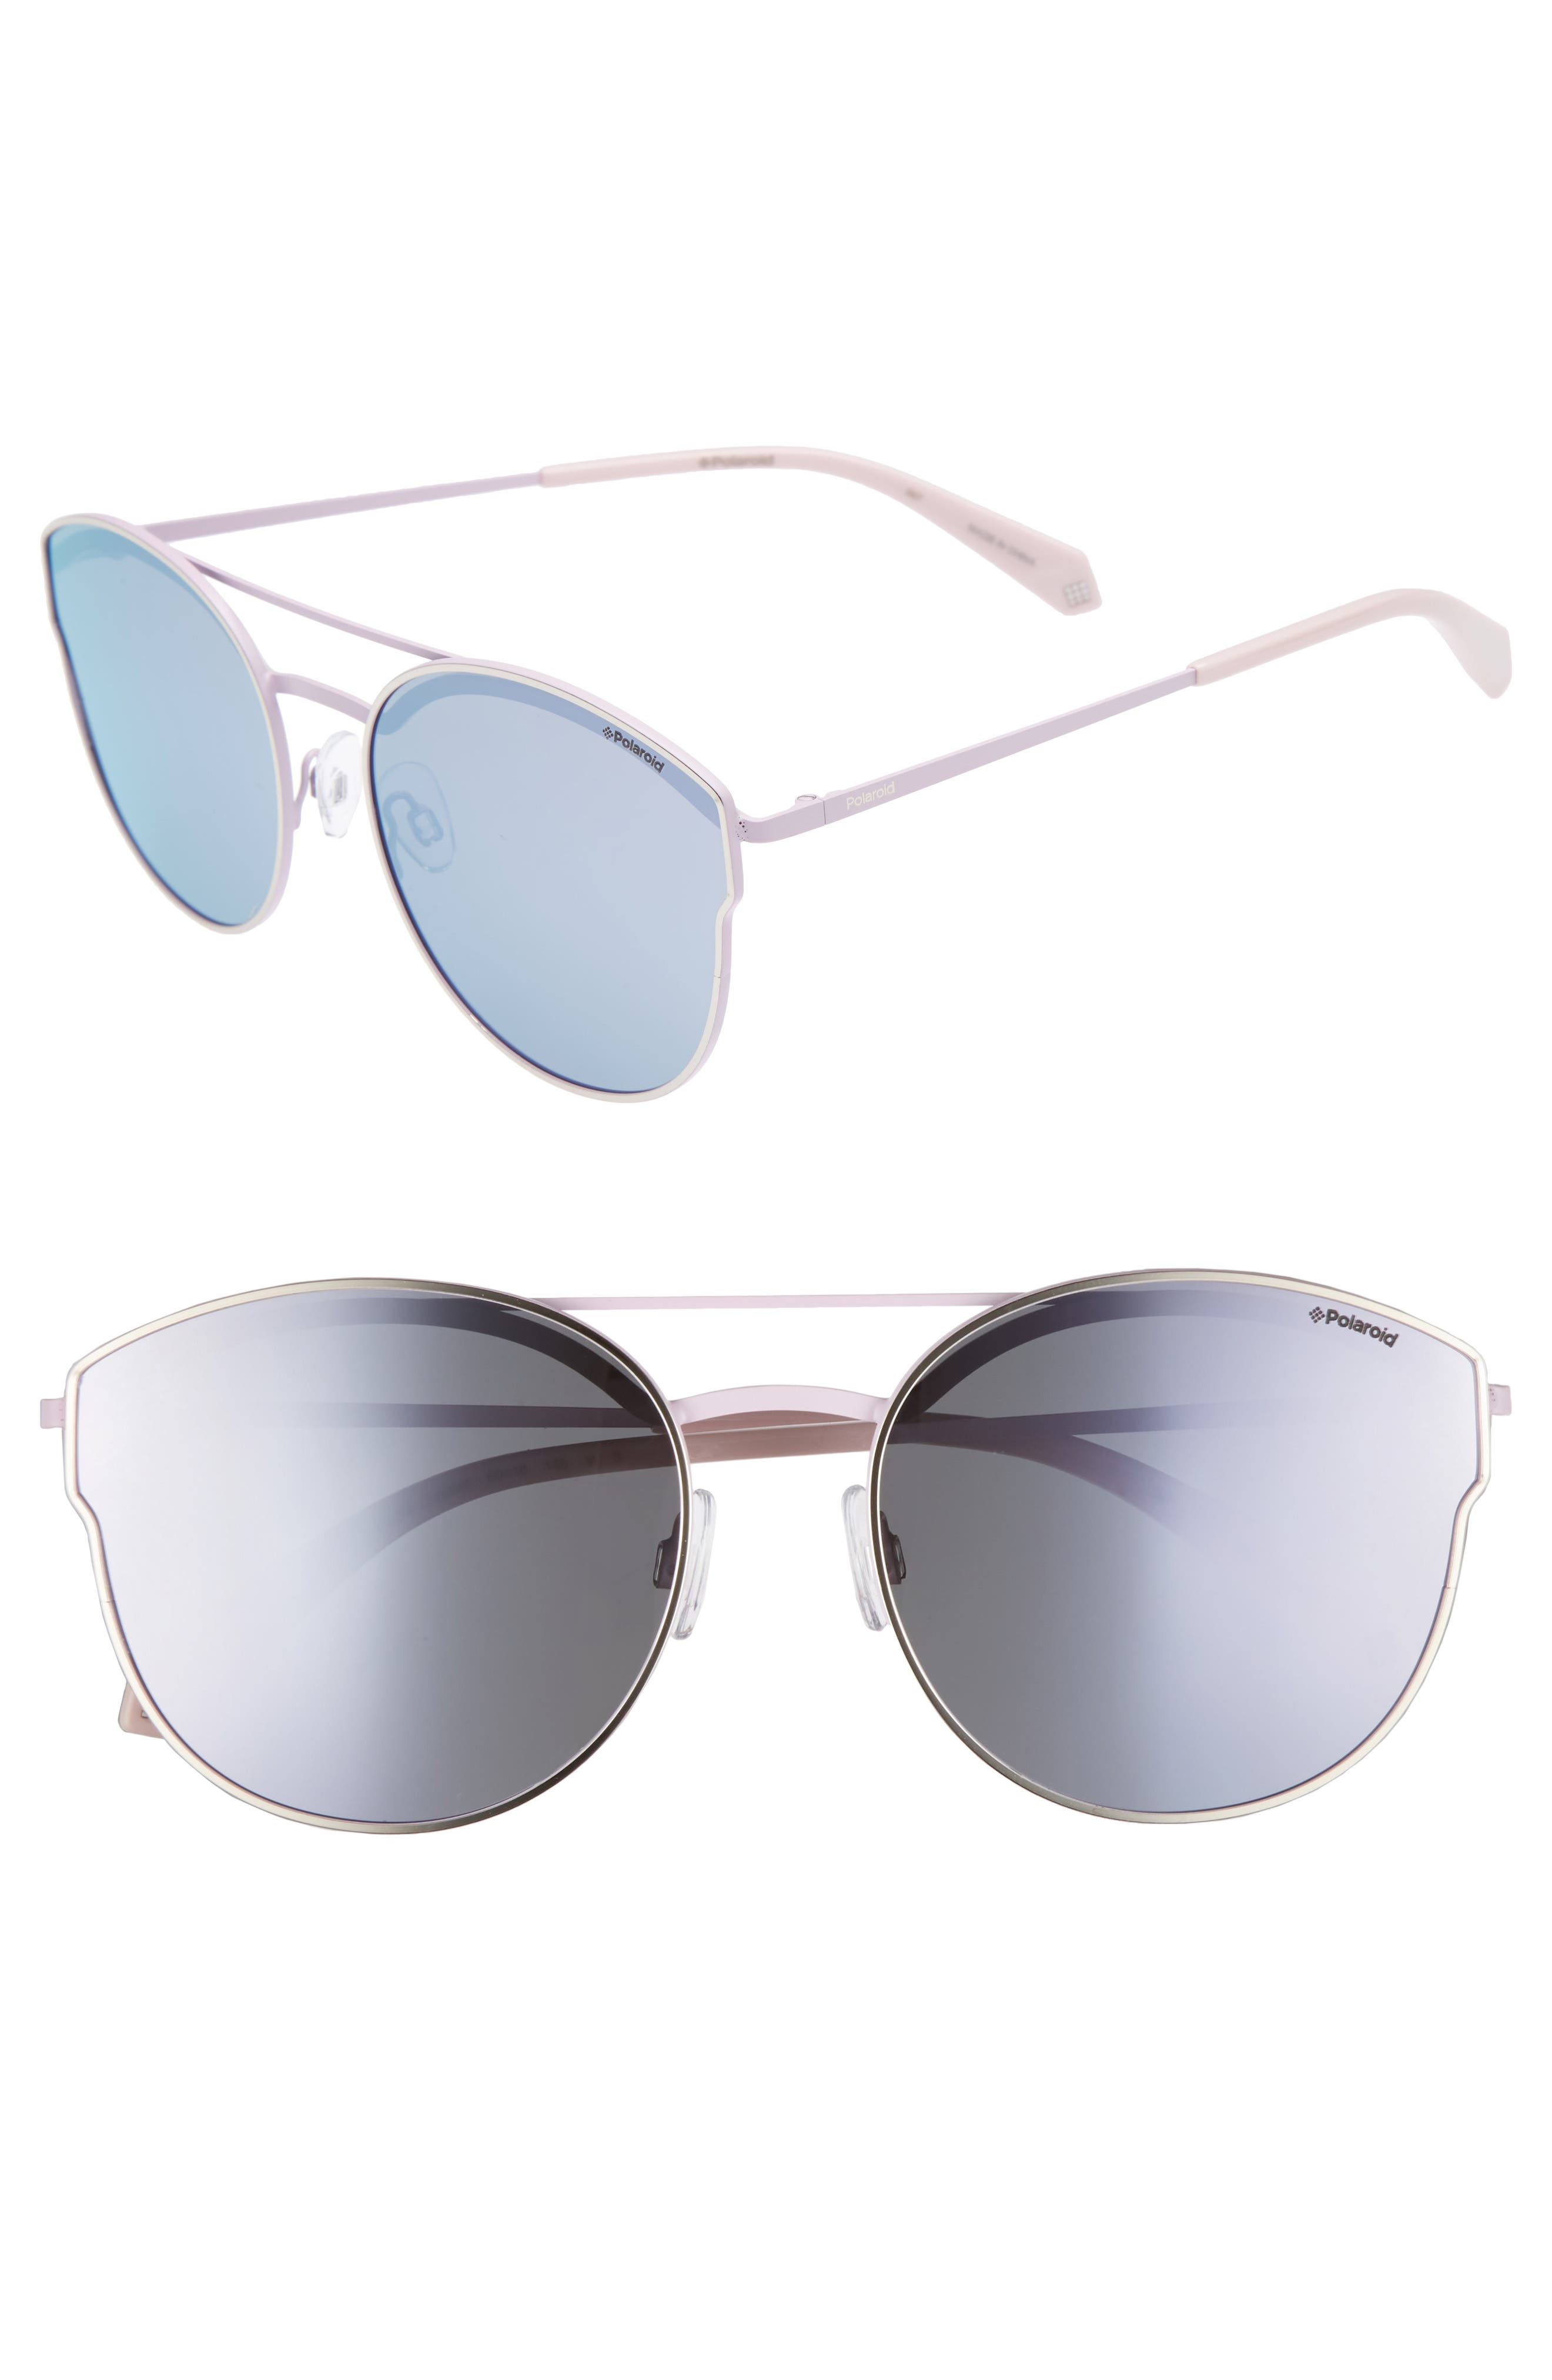 60mm Polarized Round Aviator Sunglasses,                         Main,                         color, Light Gold